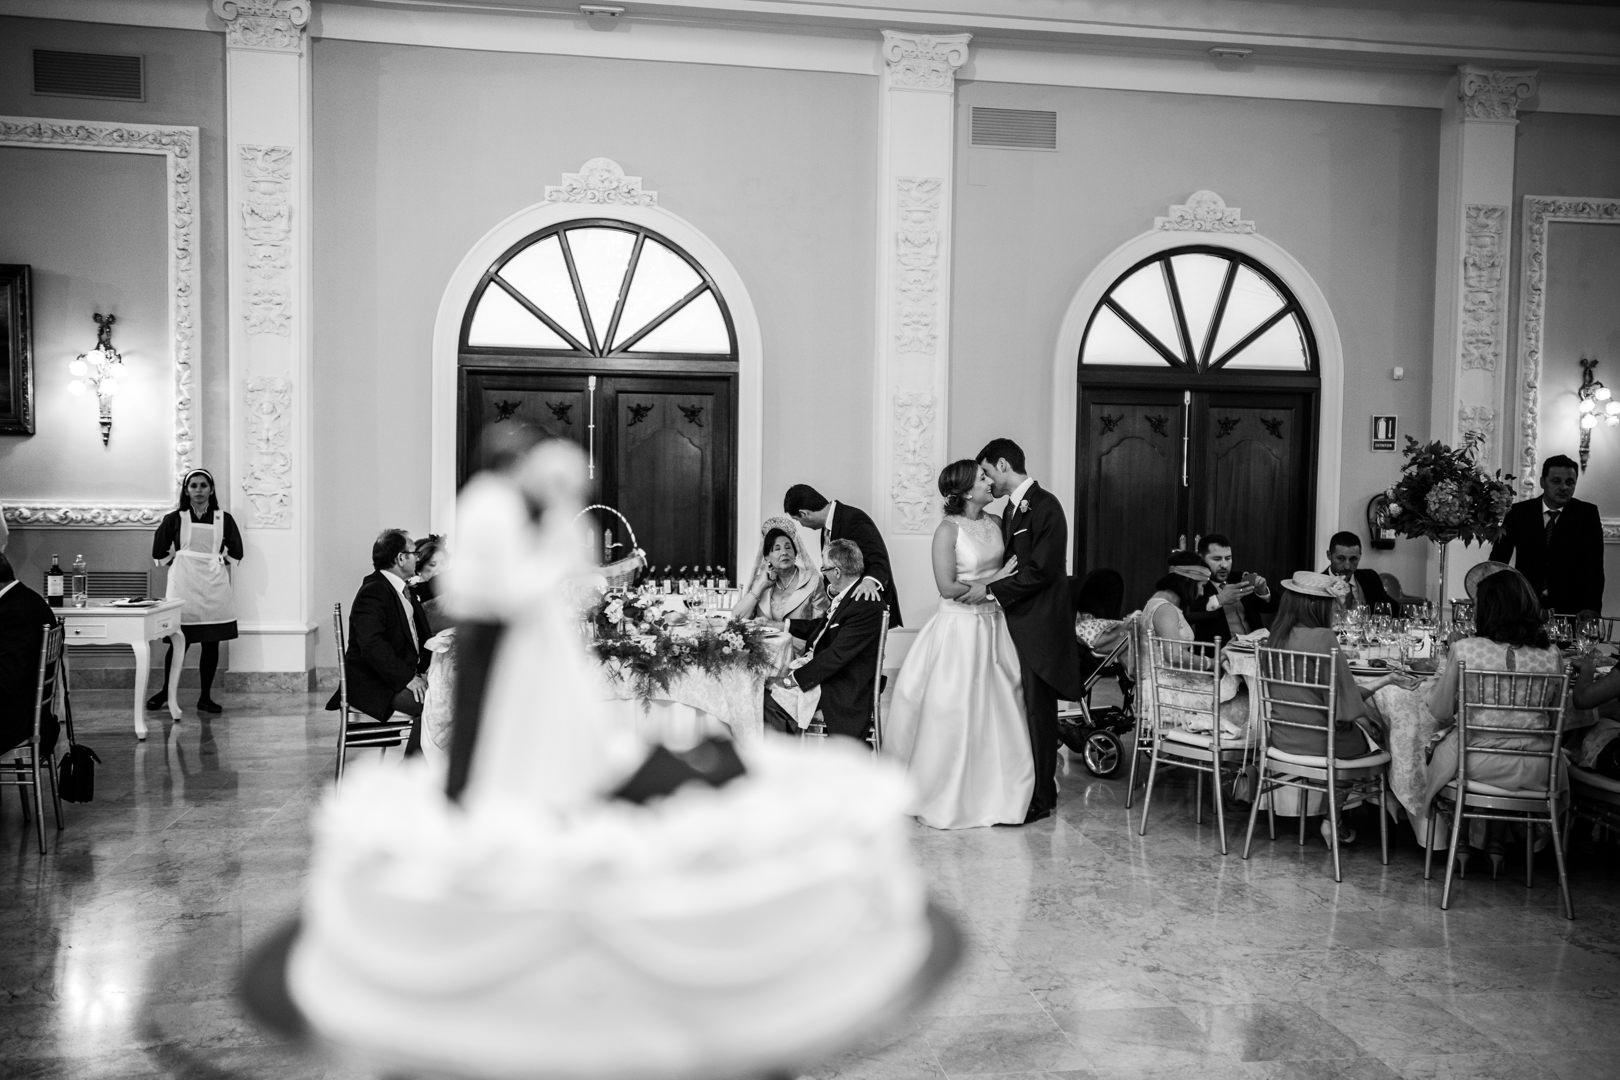 Boda-Catedral-Jaen-Hamburgo-Maria-David-engagement-Rafael-Torres-fotografo-bodas-sevilla-madrid-barcelona-wedding-photographer--37.jpg